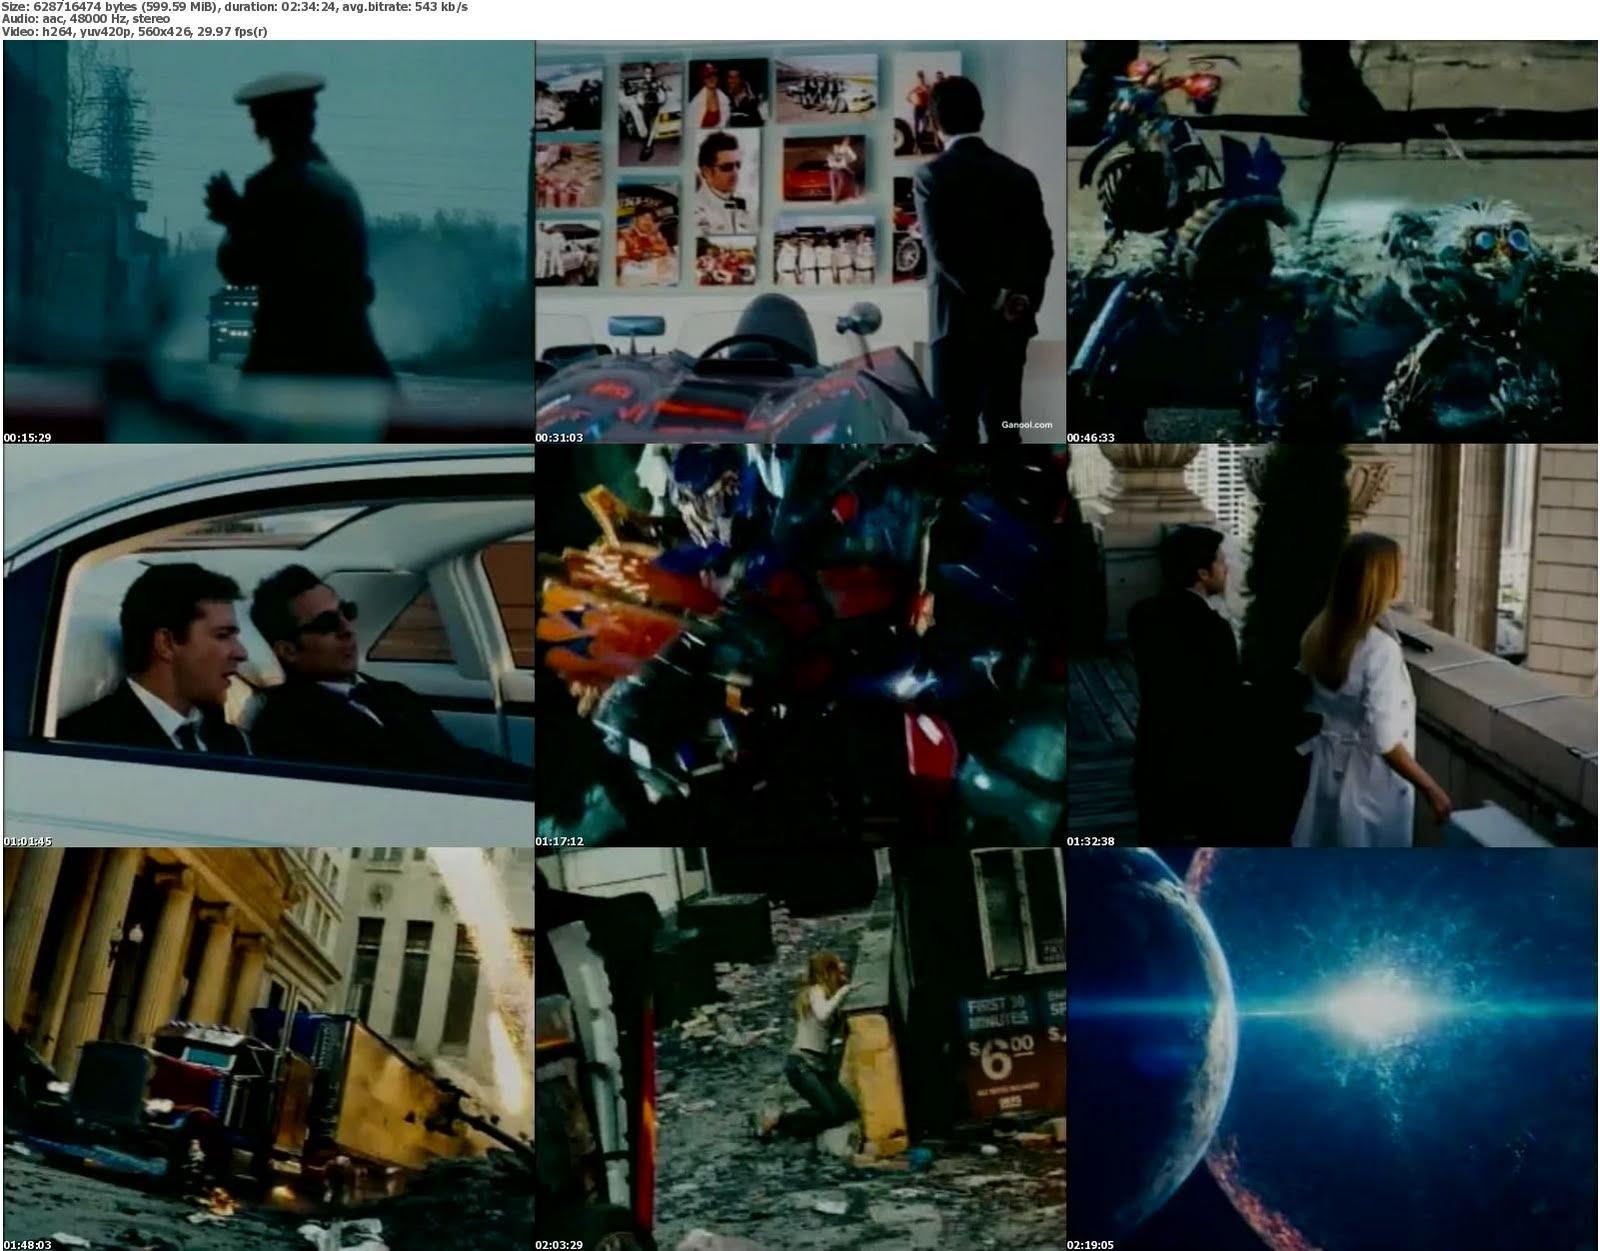 http://1.bp.blogspot.com/-BtIr_qQnDoY/TmF9GDLcDcI/AAAAAAAABmM/A-a67f5fzOU/s1600/Transformers+3+Dark+of+The+Moon+%25282011%2529+PPVRip+600MB+Mediafirehbo.com.jpg